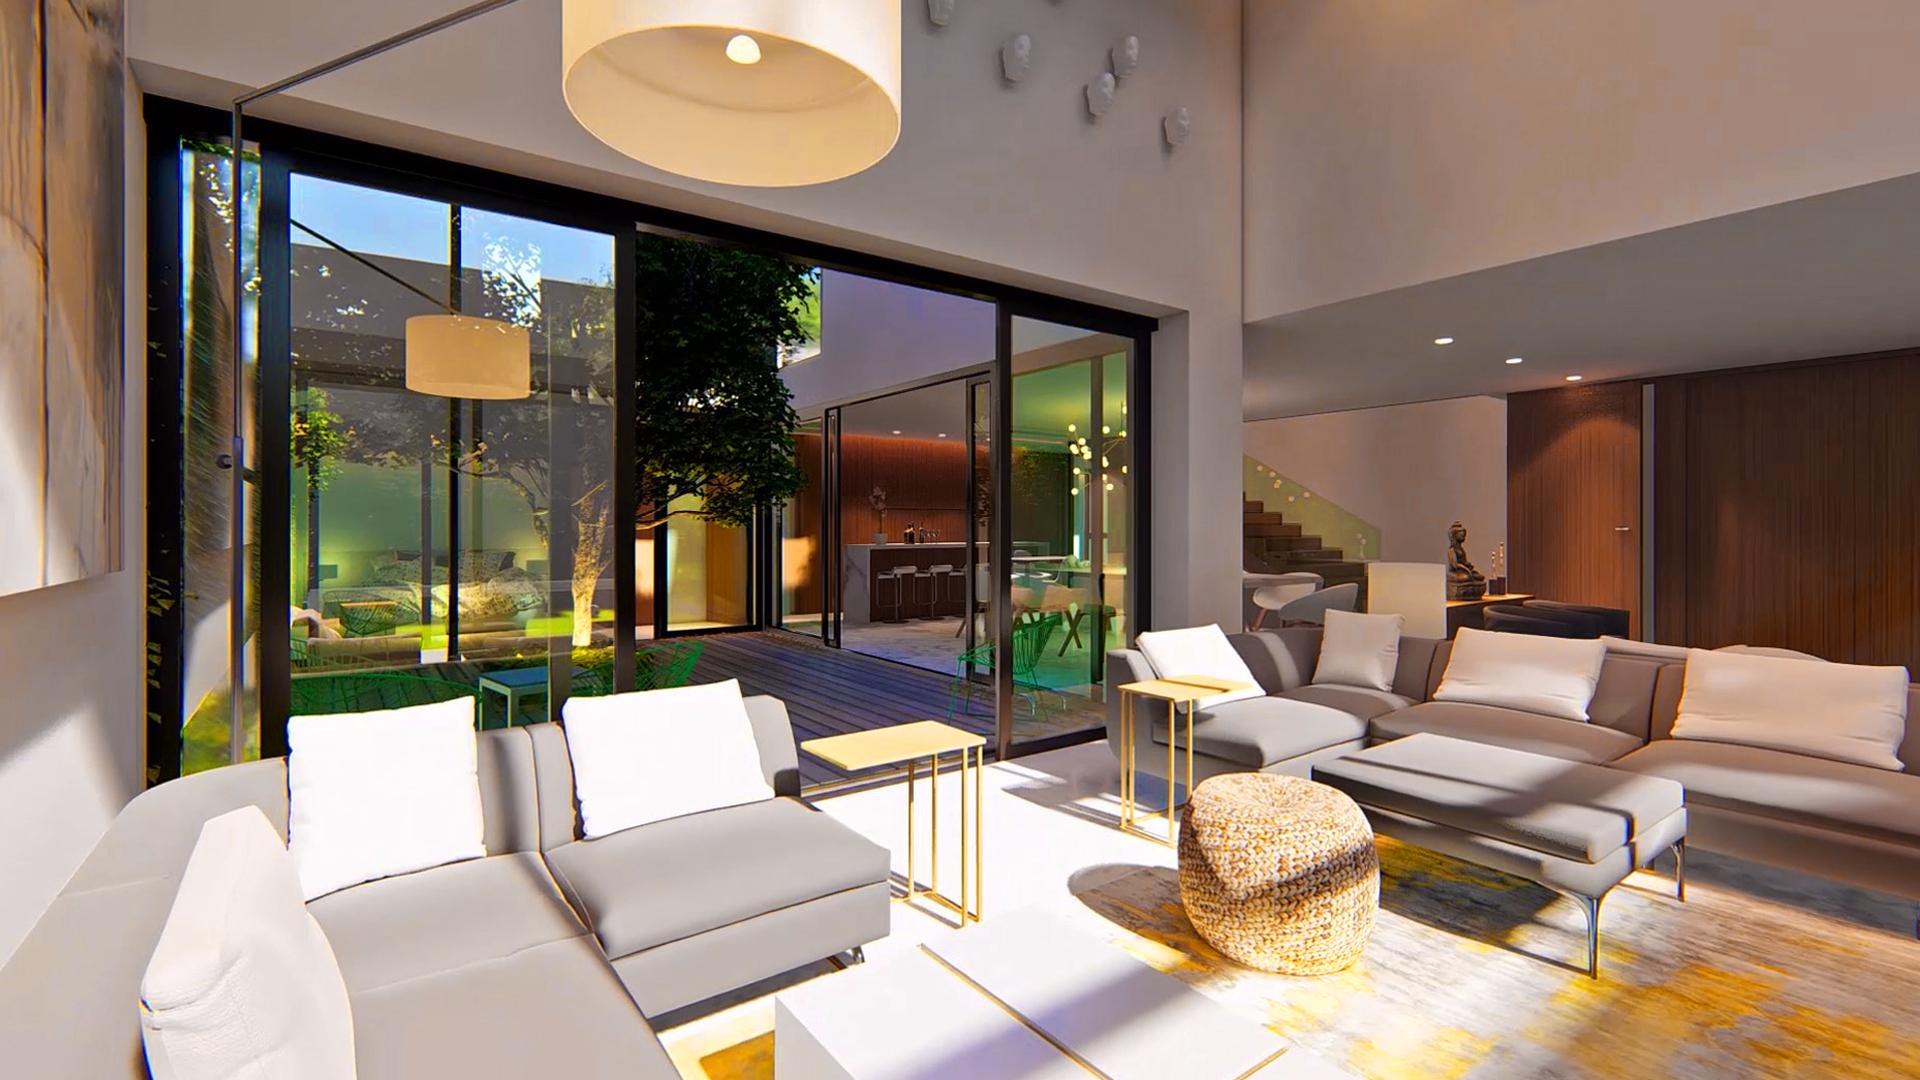 MAP_Design_House_Architecture_Modern_Architect_Kiran_Mathema_Veranda_Living